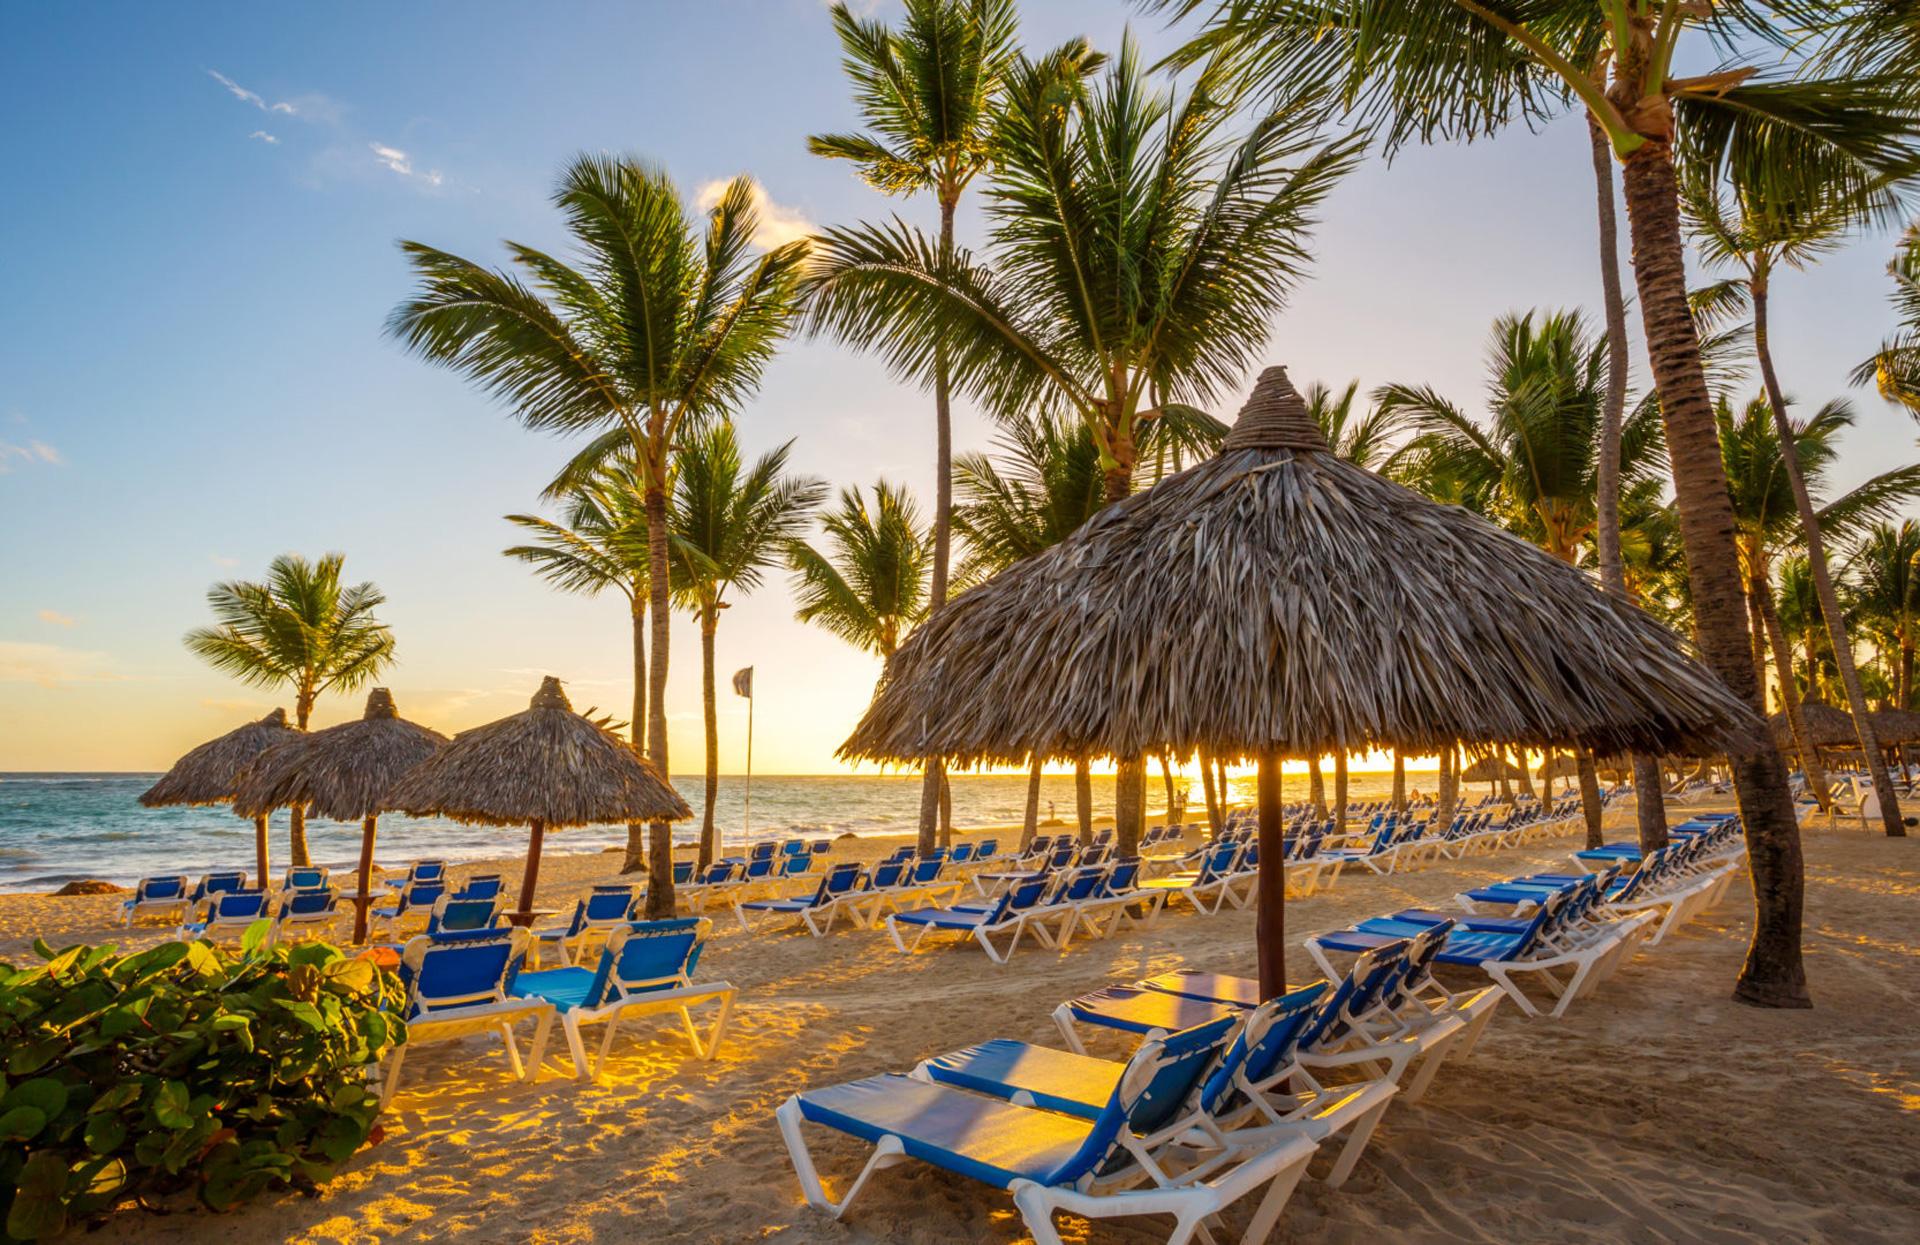 Private Jet Charter to Dominican Republic